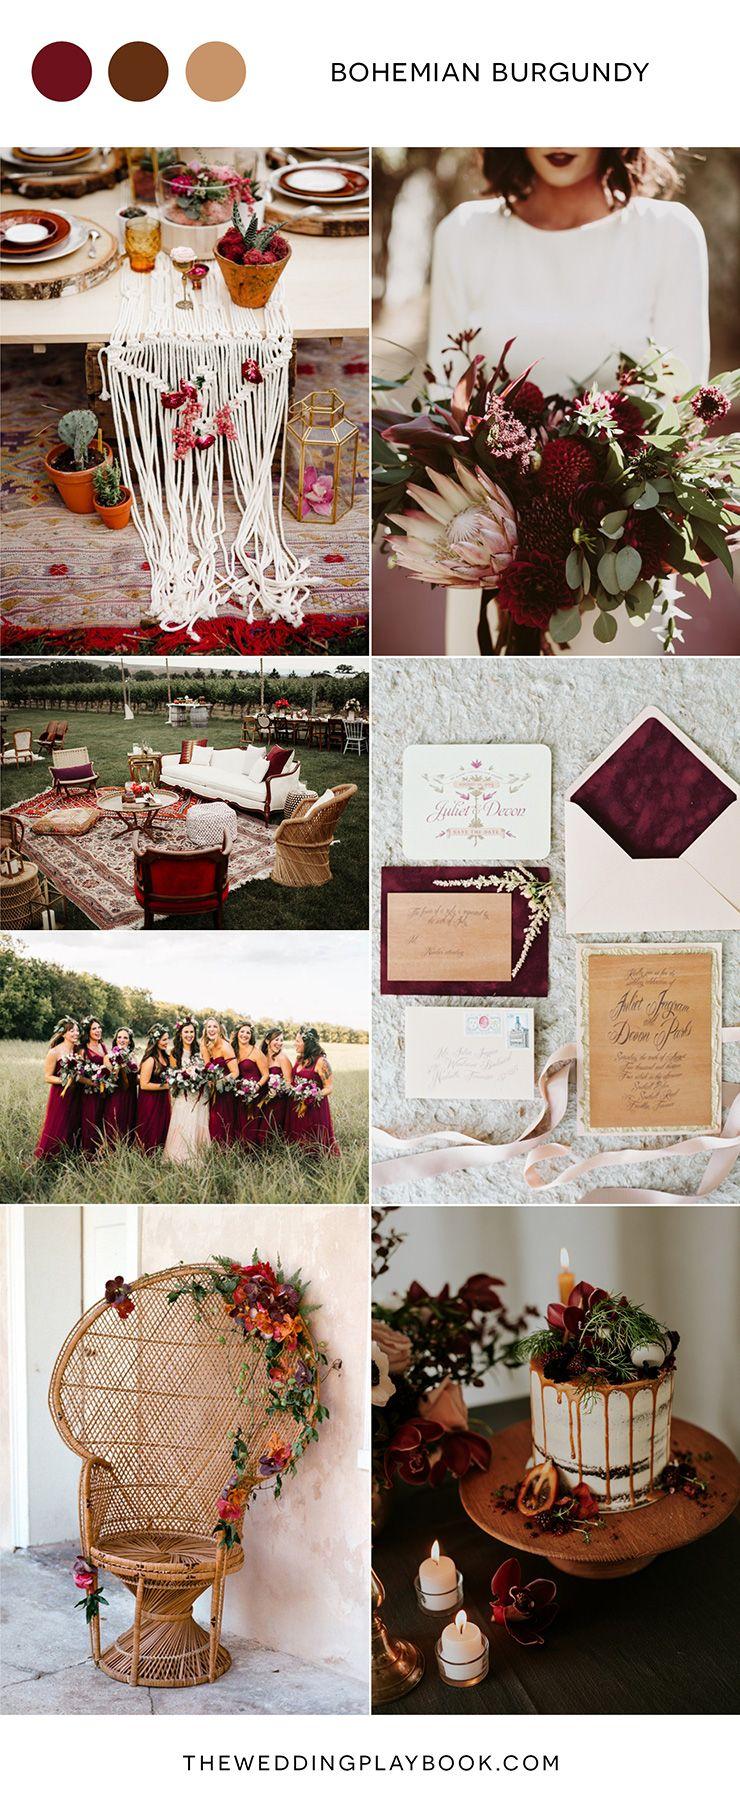 bohemian burgundy wedding inspiration inspiration moodboard farben pinterest boho. Black Bedroom Furniture Sets. Home Design Ideas